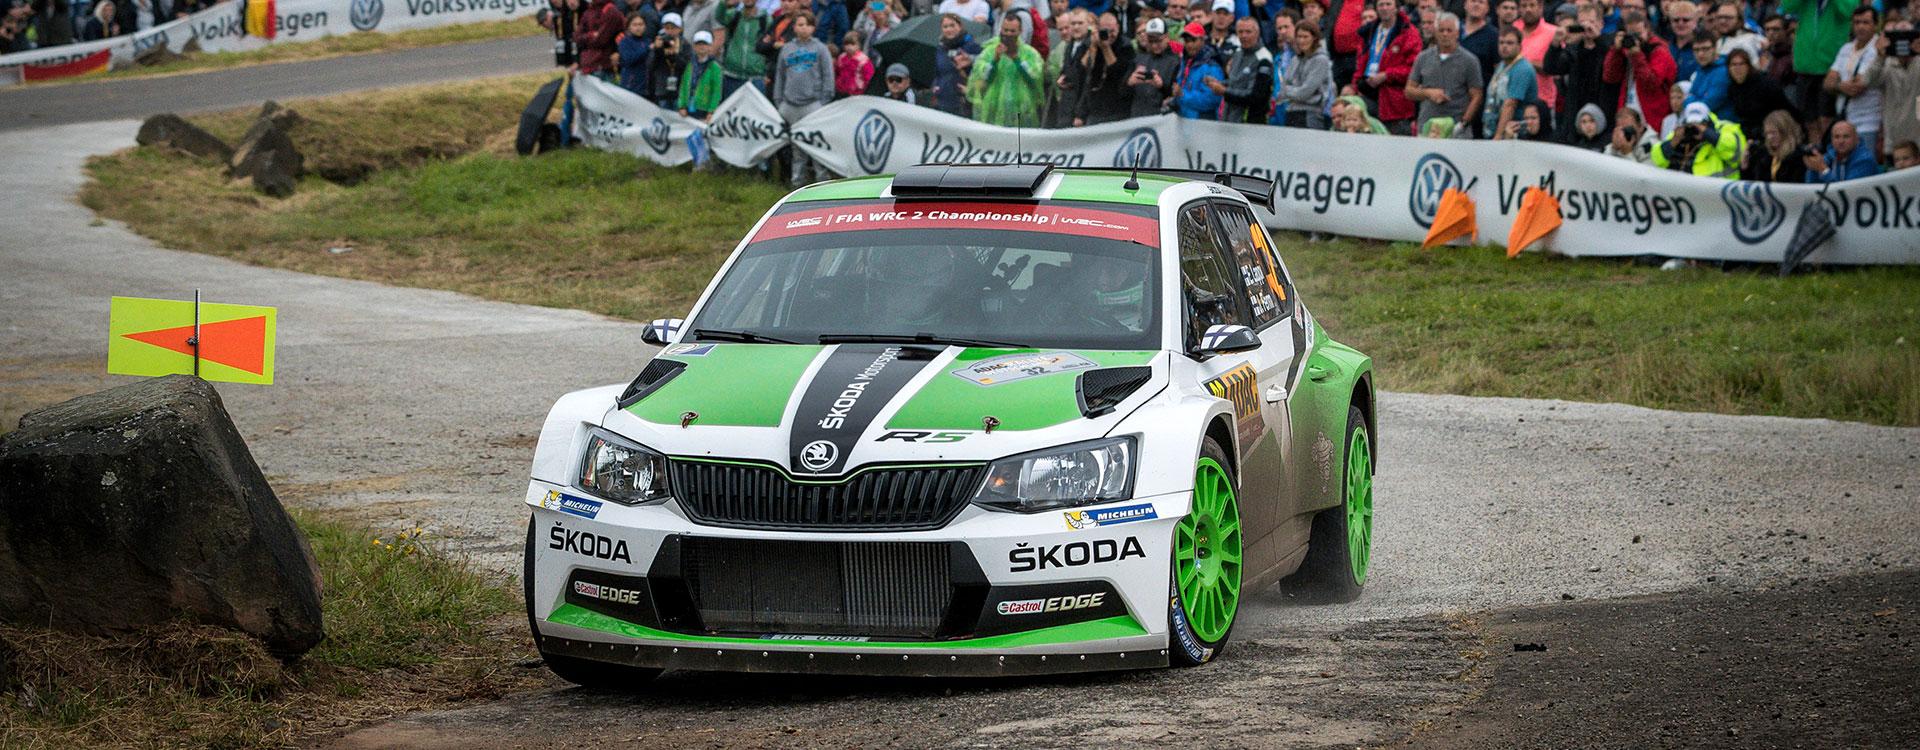 ŠKODA extends lead at the Rally Germany